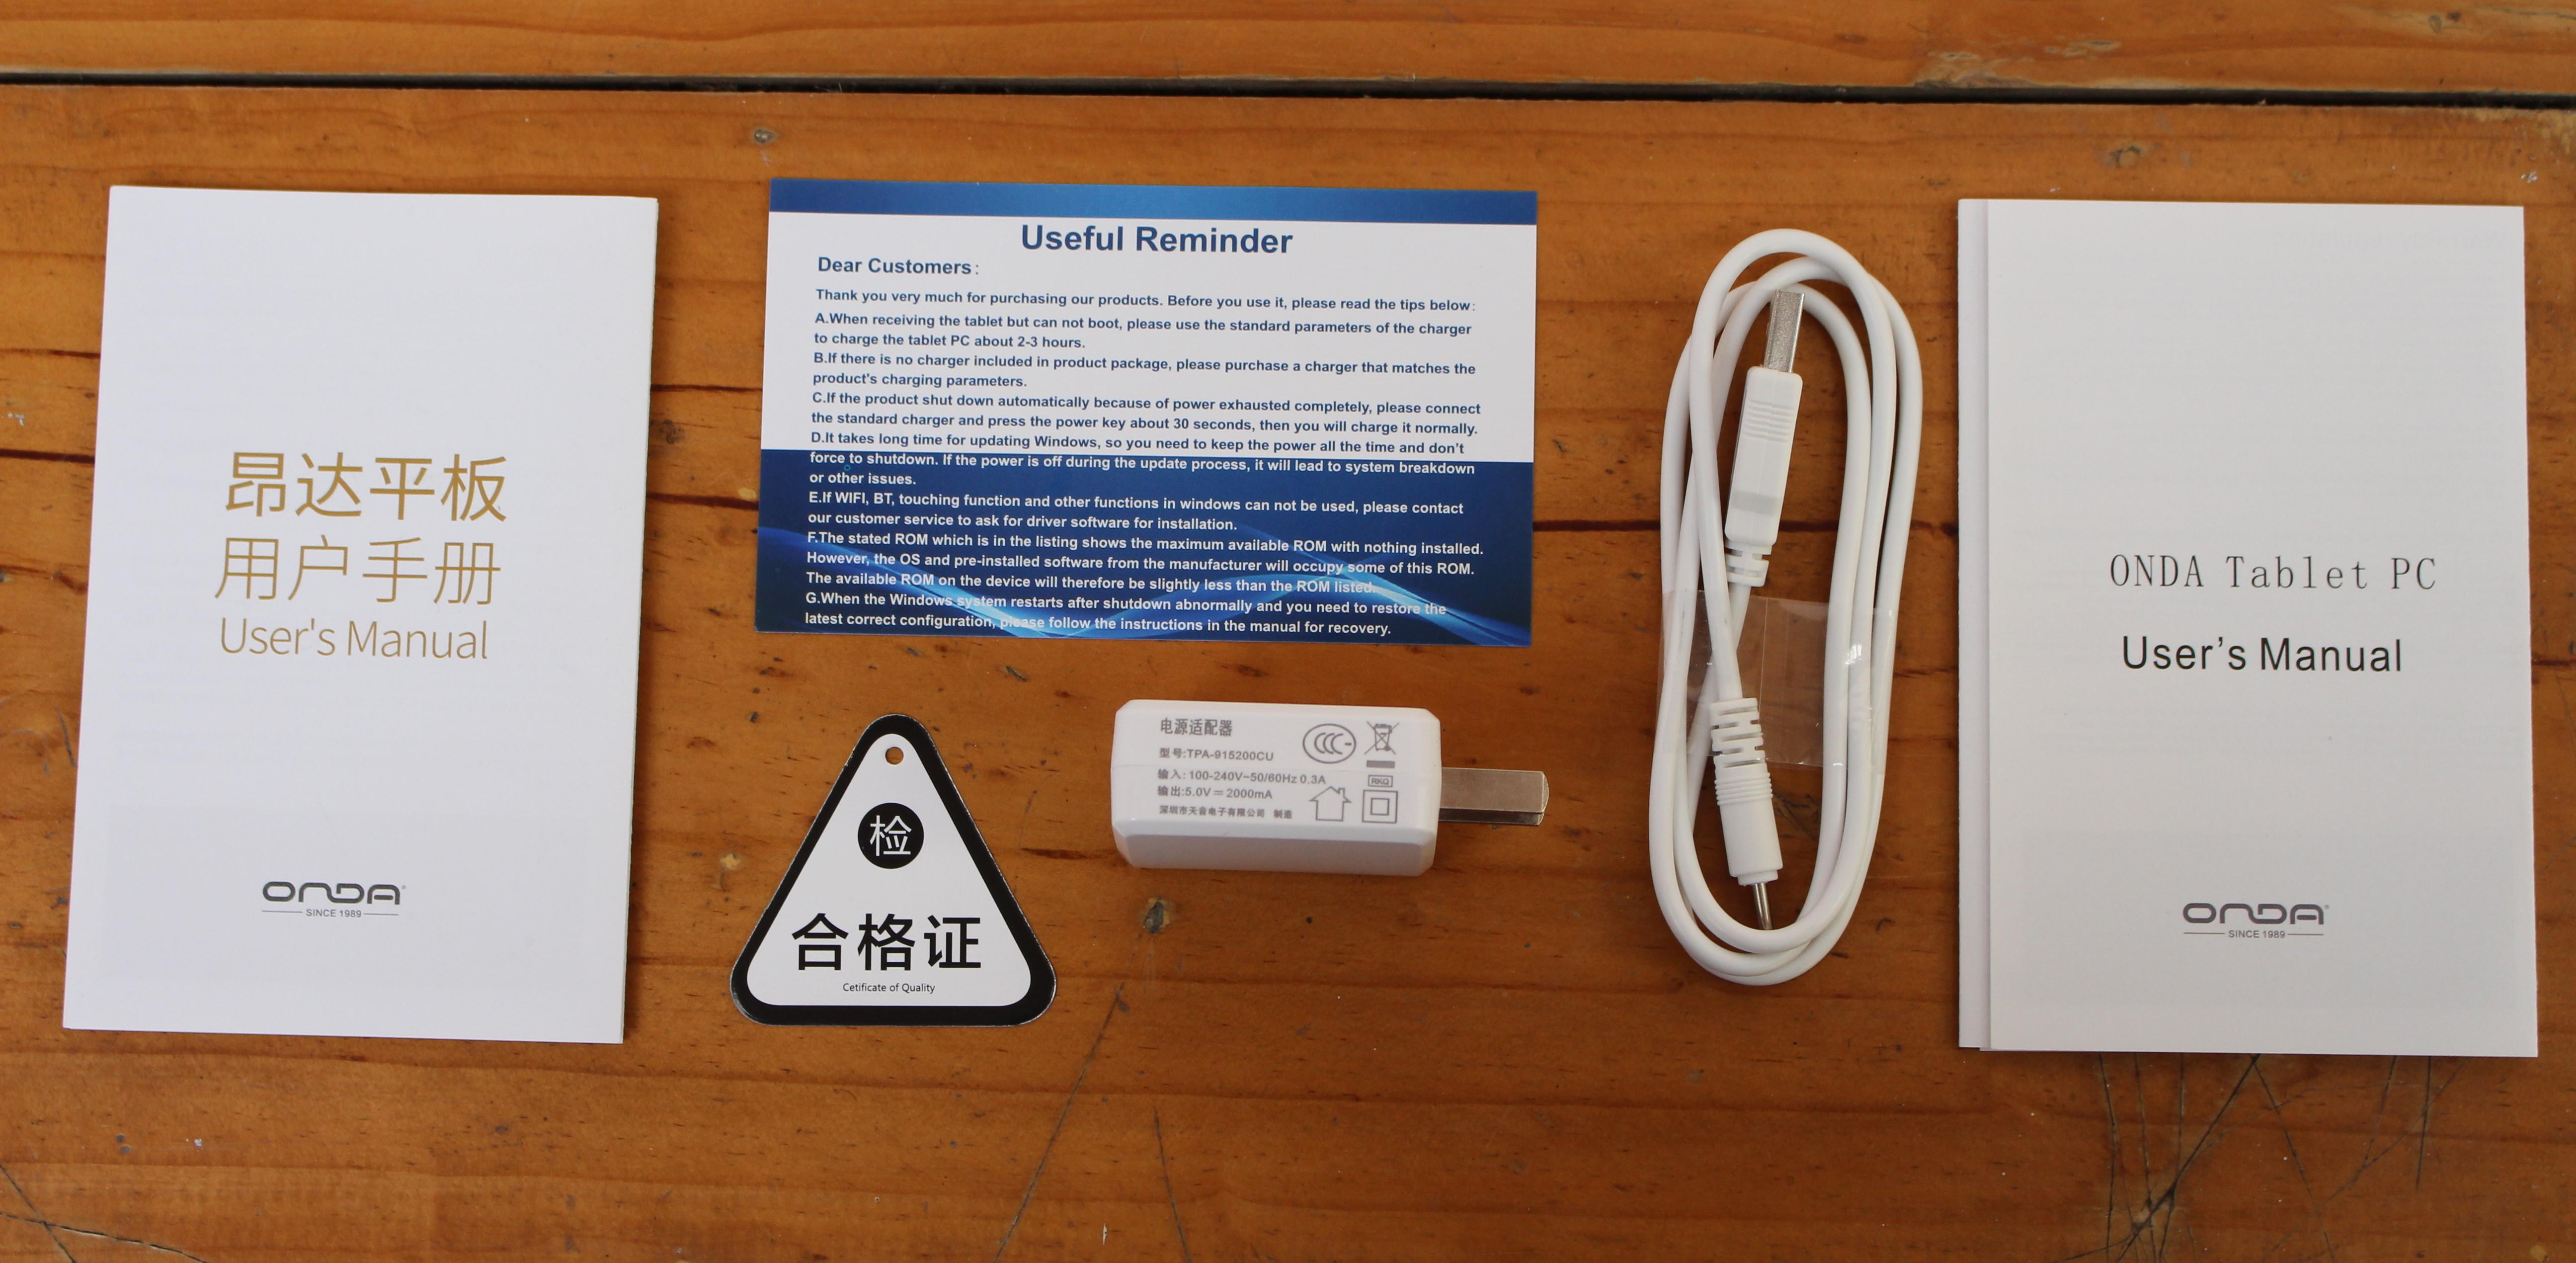 Onda V18 Pro (Allwinner A63) 2K Tablet Review - Part 1: Unboxing